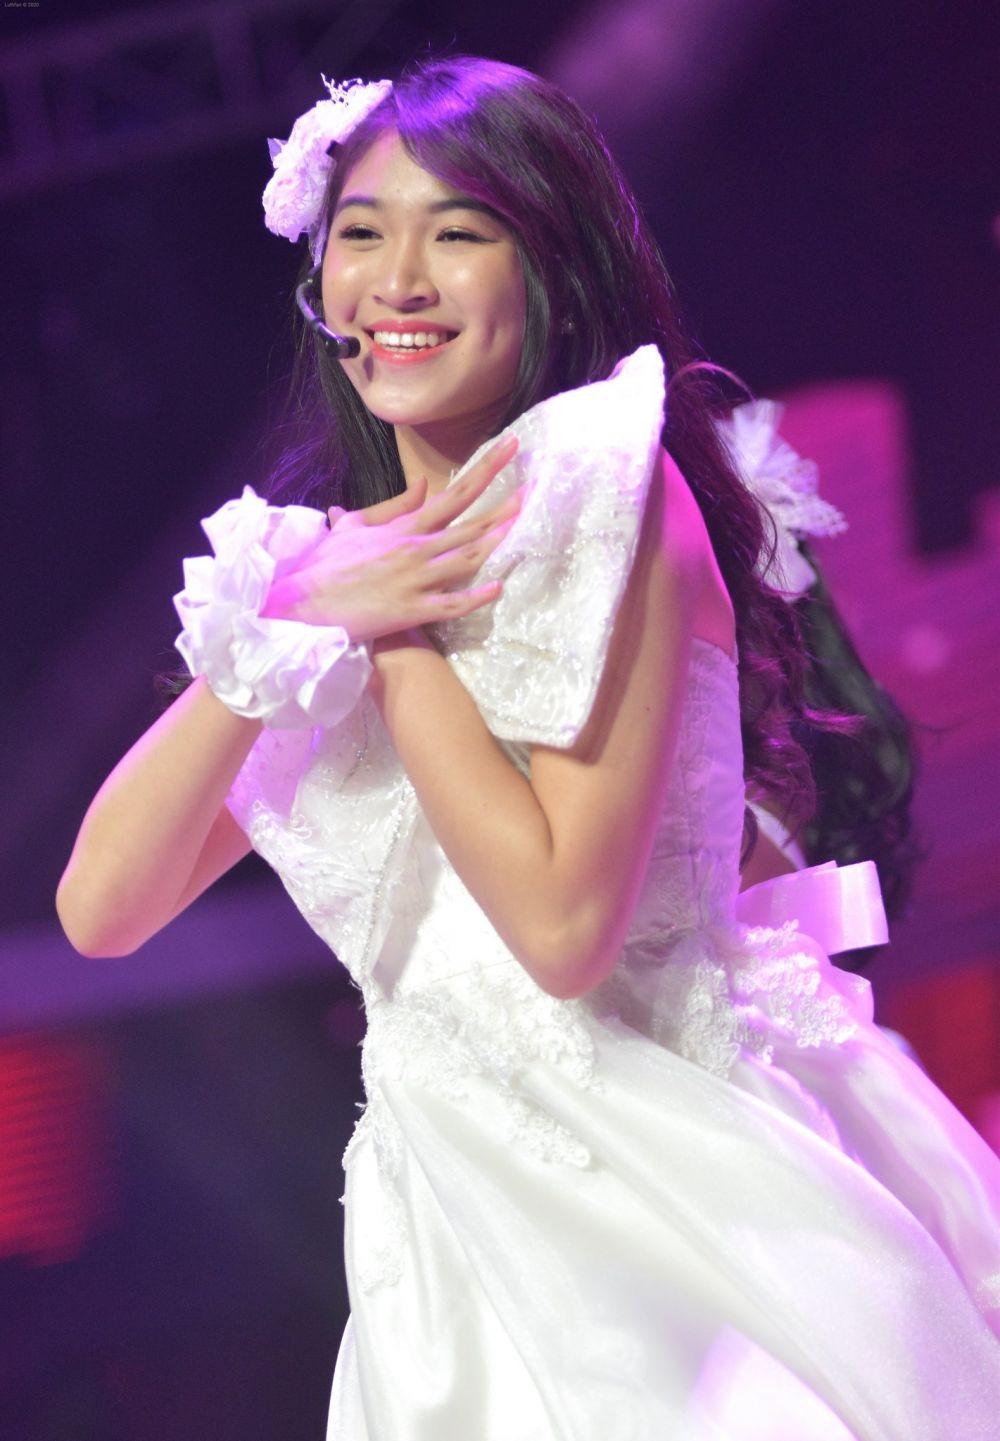 10 Potret Member Jkt48 Dalam Kostum Rapsodi Bikin Adem Banget